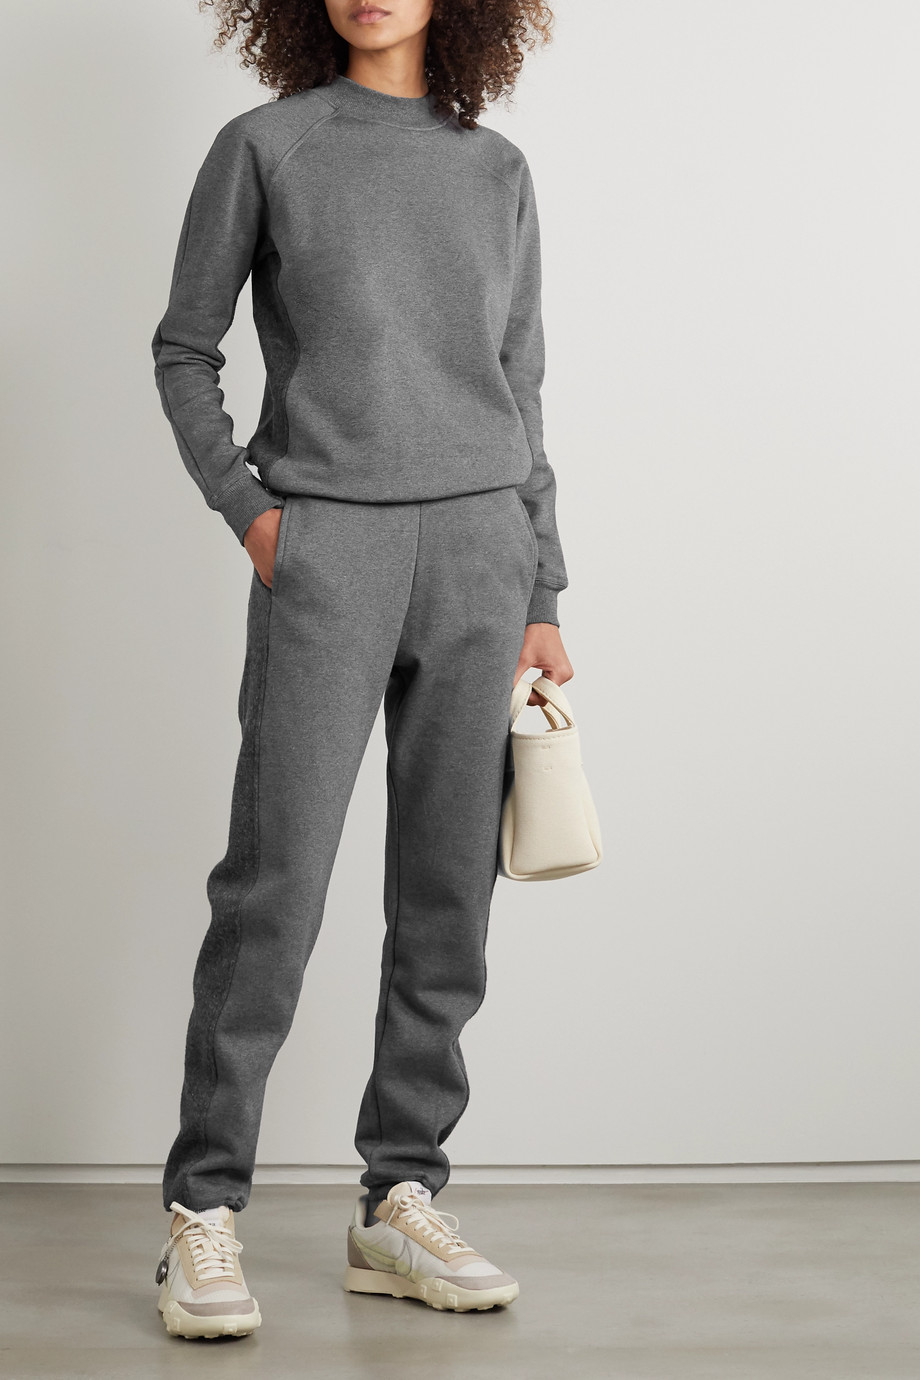 Vaara Rumer Sweatshirt aus Biobaumwoll-Jersey